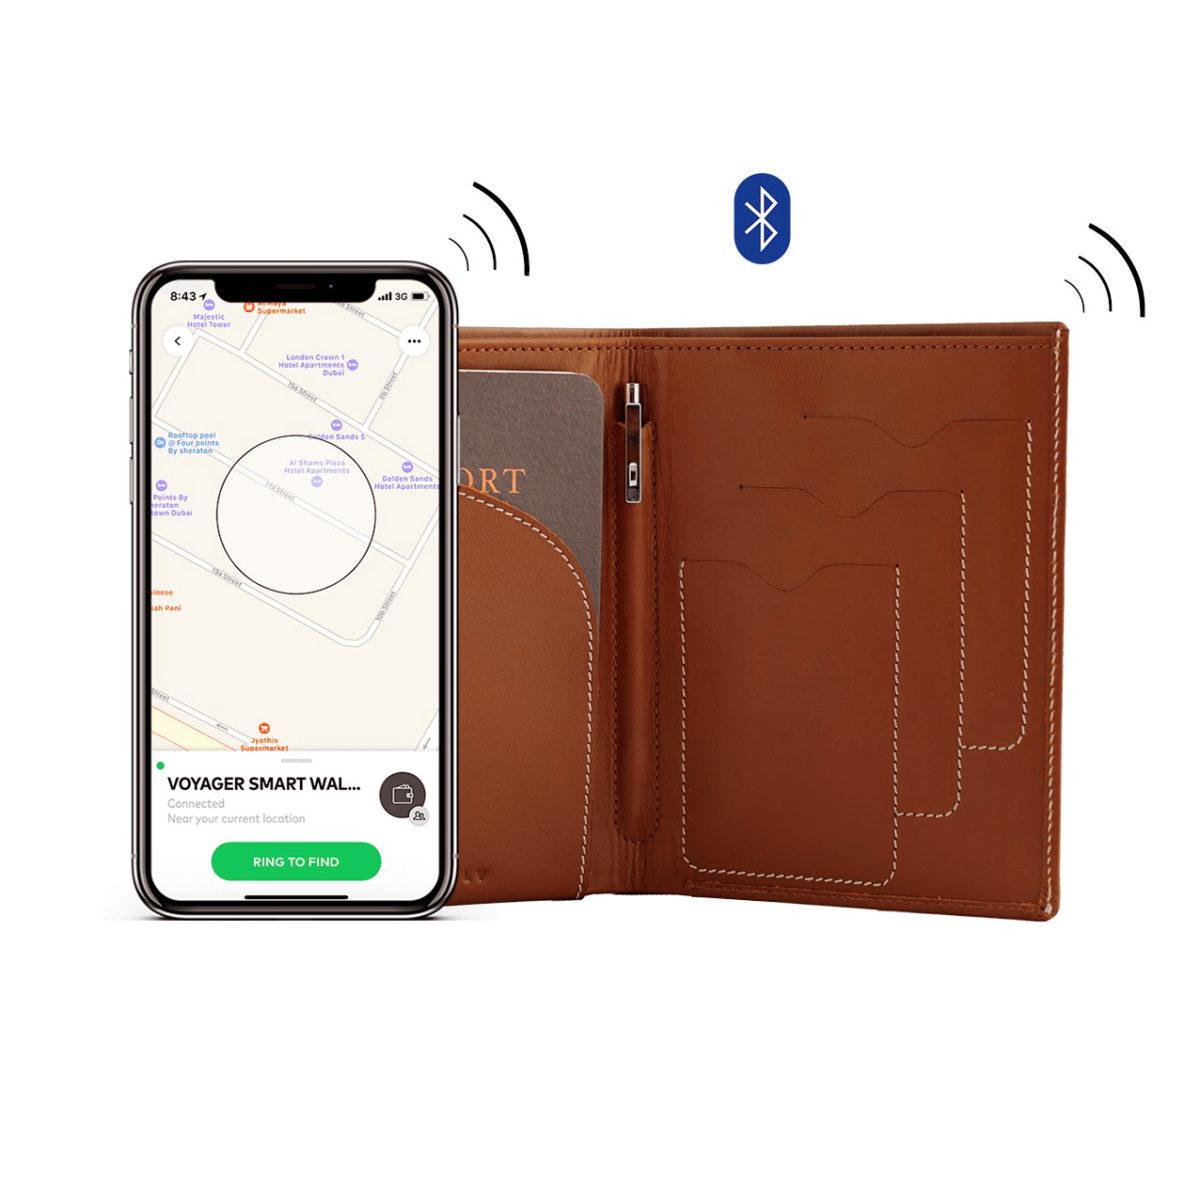 01 Tan Voyager Leather Wallet Anti Loss Electronic Smart Tech